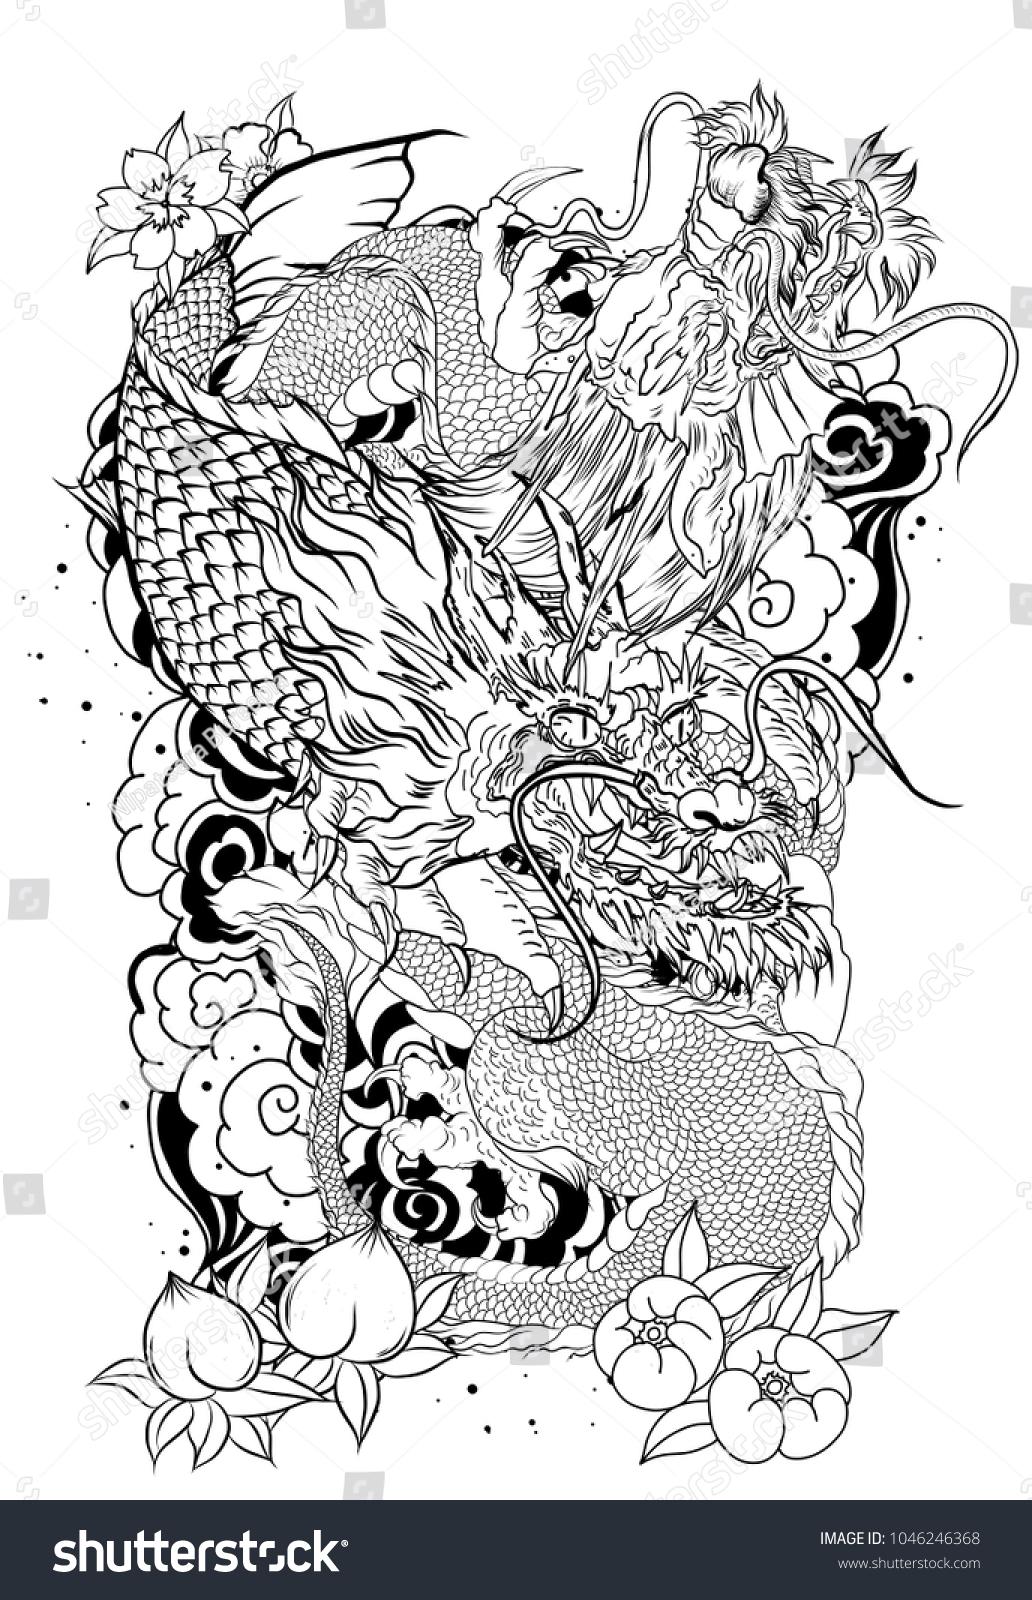 Silhouette dragon koi dragon lotus flower stock vector 1046246368 silhouette dragon with koi dragon and lotus flower tattooach with sakura and plum flower izmirmasajfo